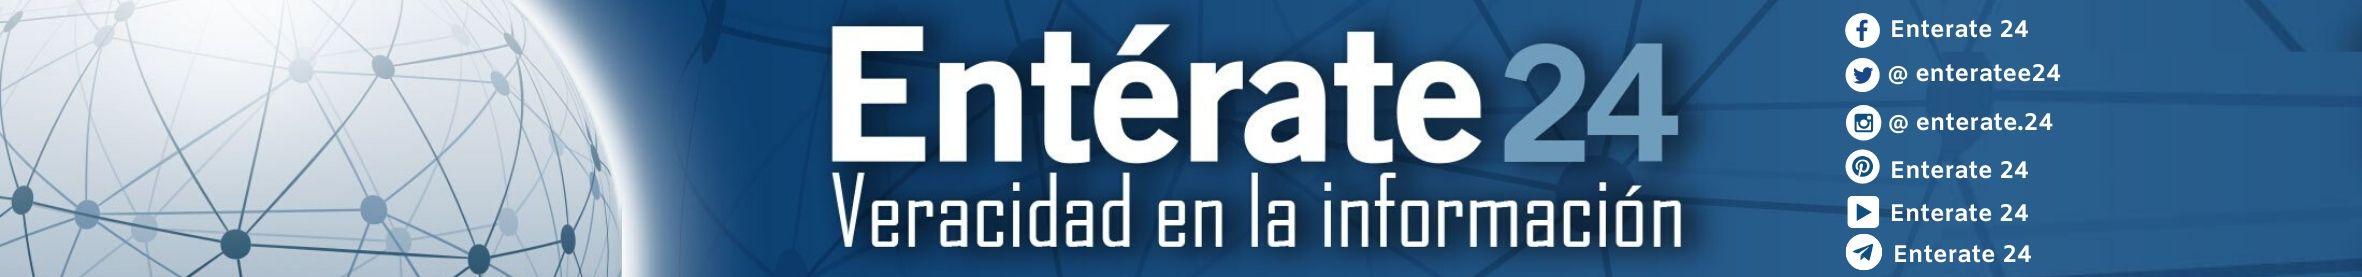 14 De Octubre Se Celebra El Dia Mundial De La Espirometria Enterate24 Com